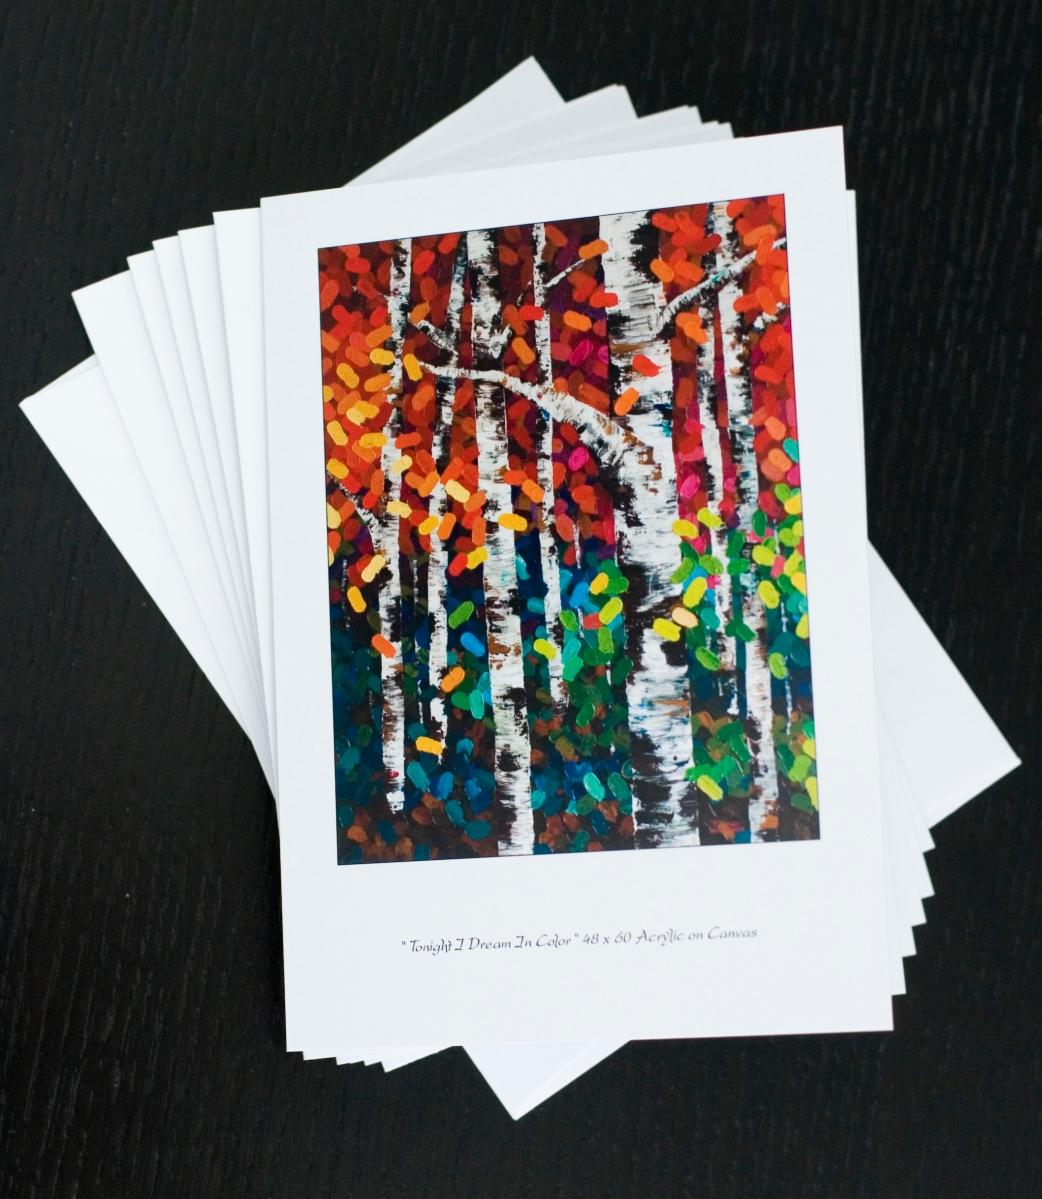 Tonight I Dream In Color 57 Greeting Card Melissa Mckinnon Artist